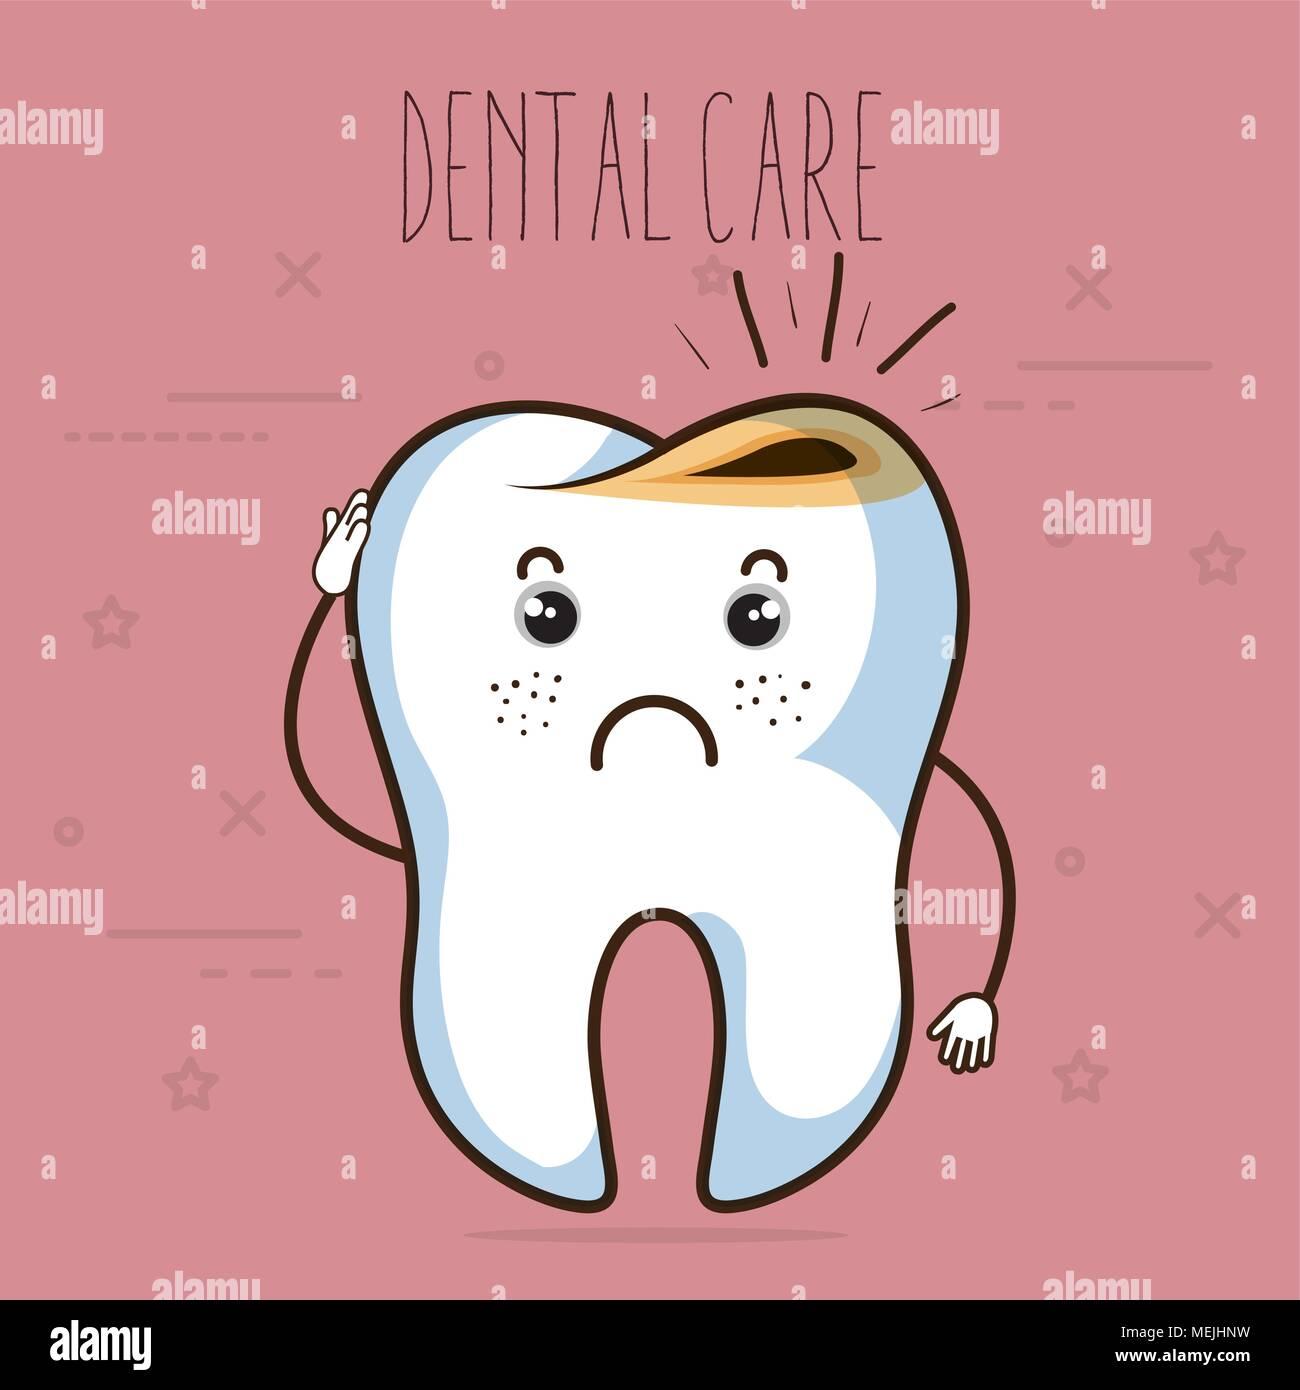 dental care kawaii comi character - Stock Image